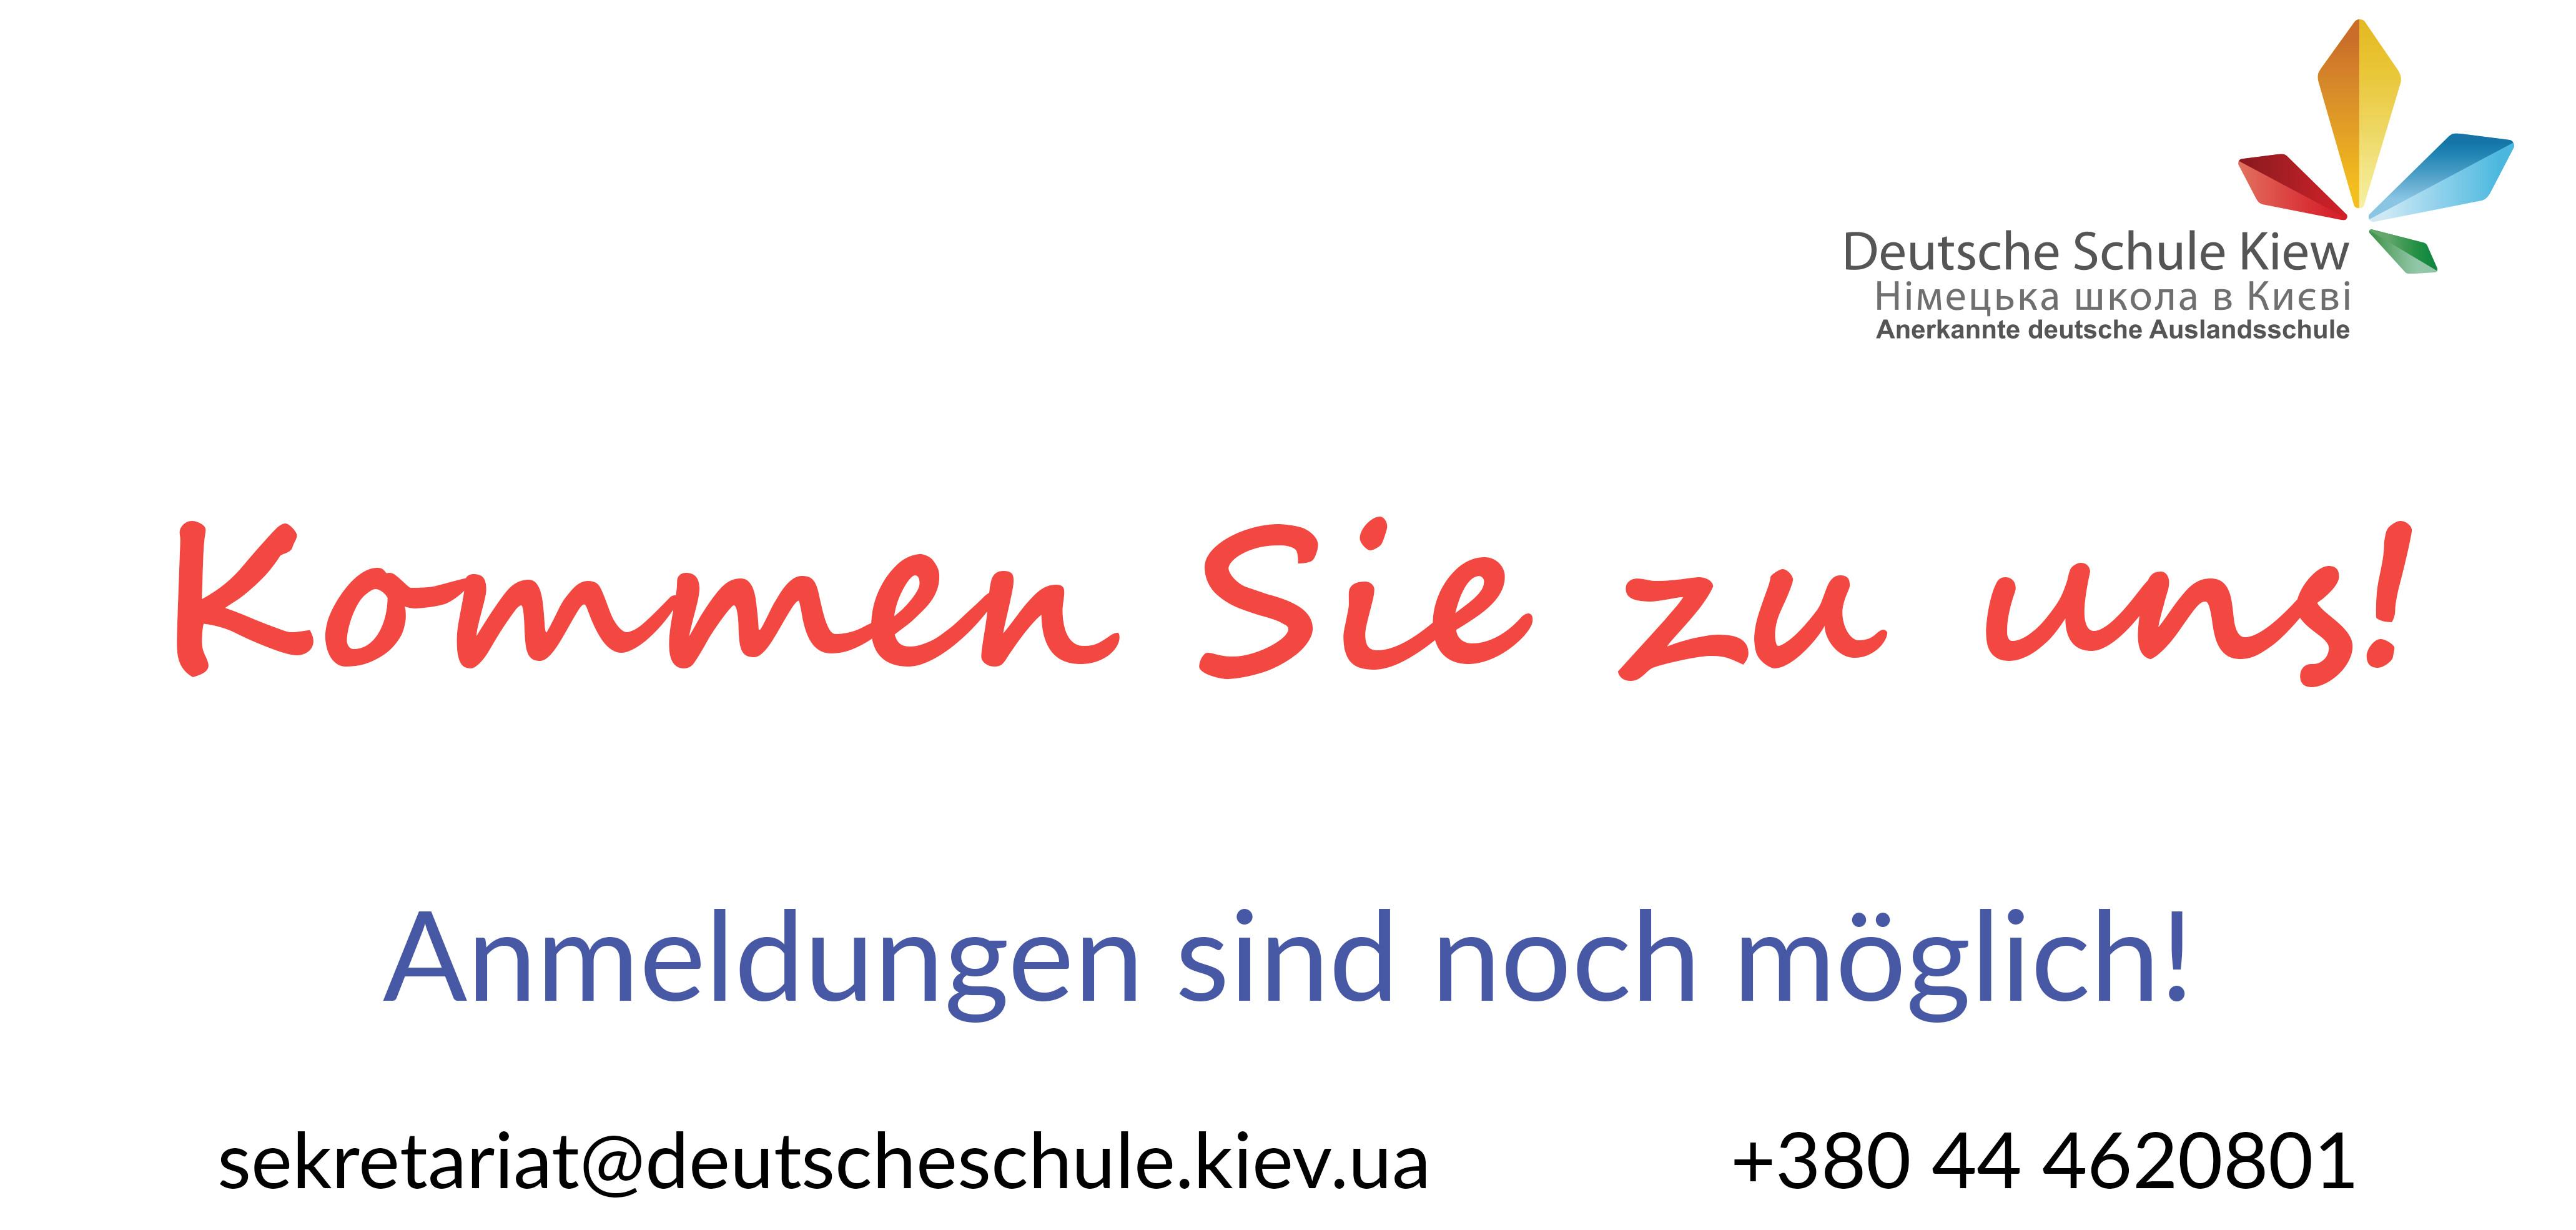 promotion_dsk_de